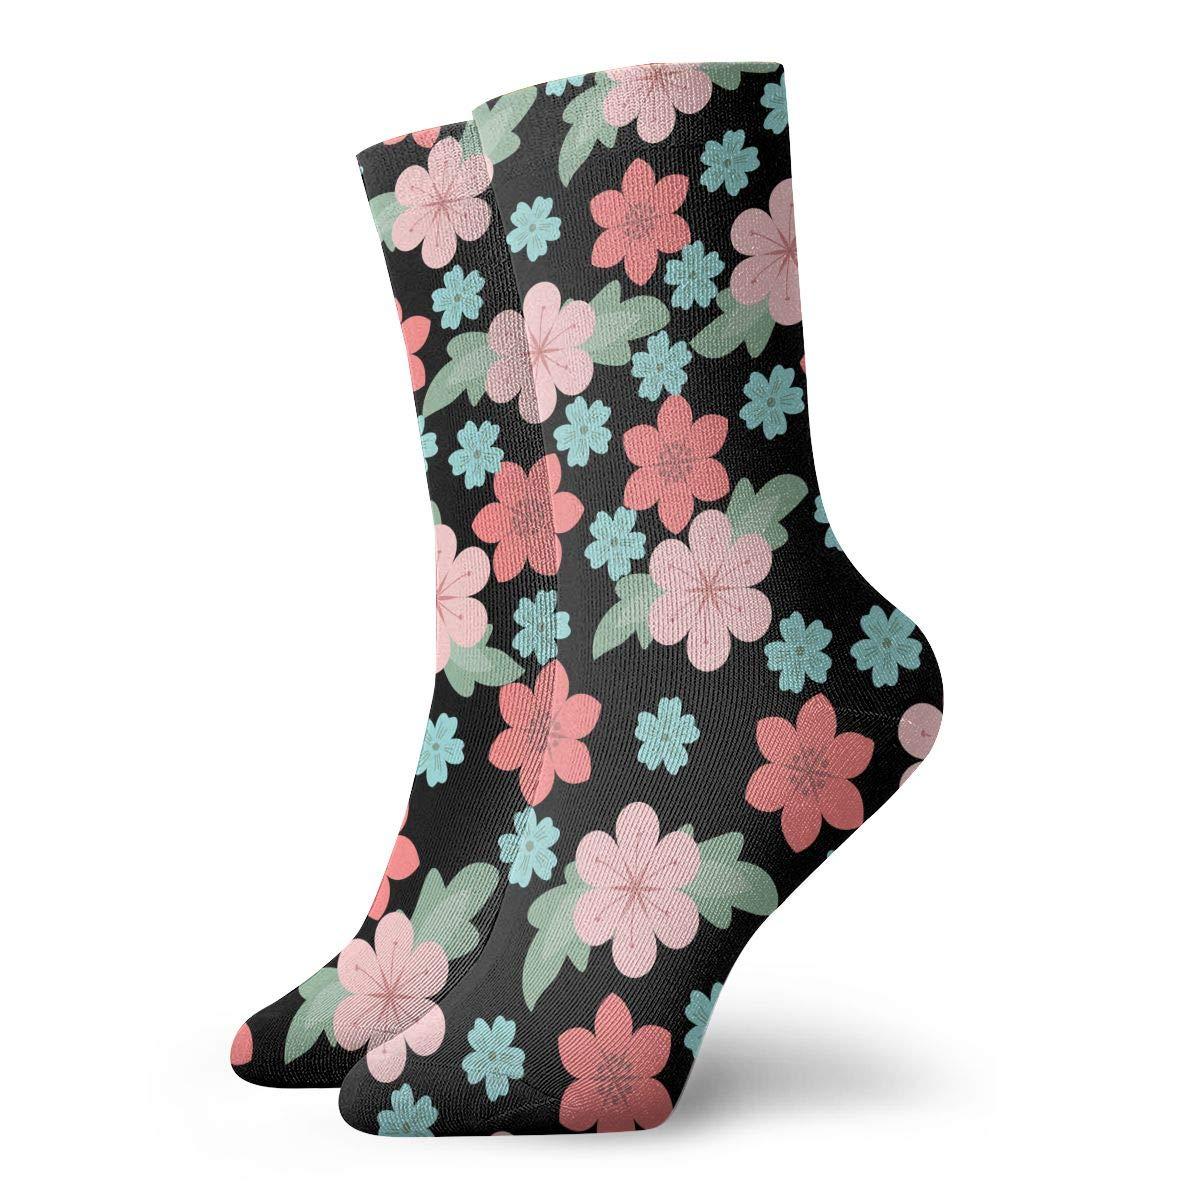 Flower Plants Unisex Funny Casual Crew Socks Athletic Socks For Boys Girls Kids Teenagers